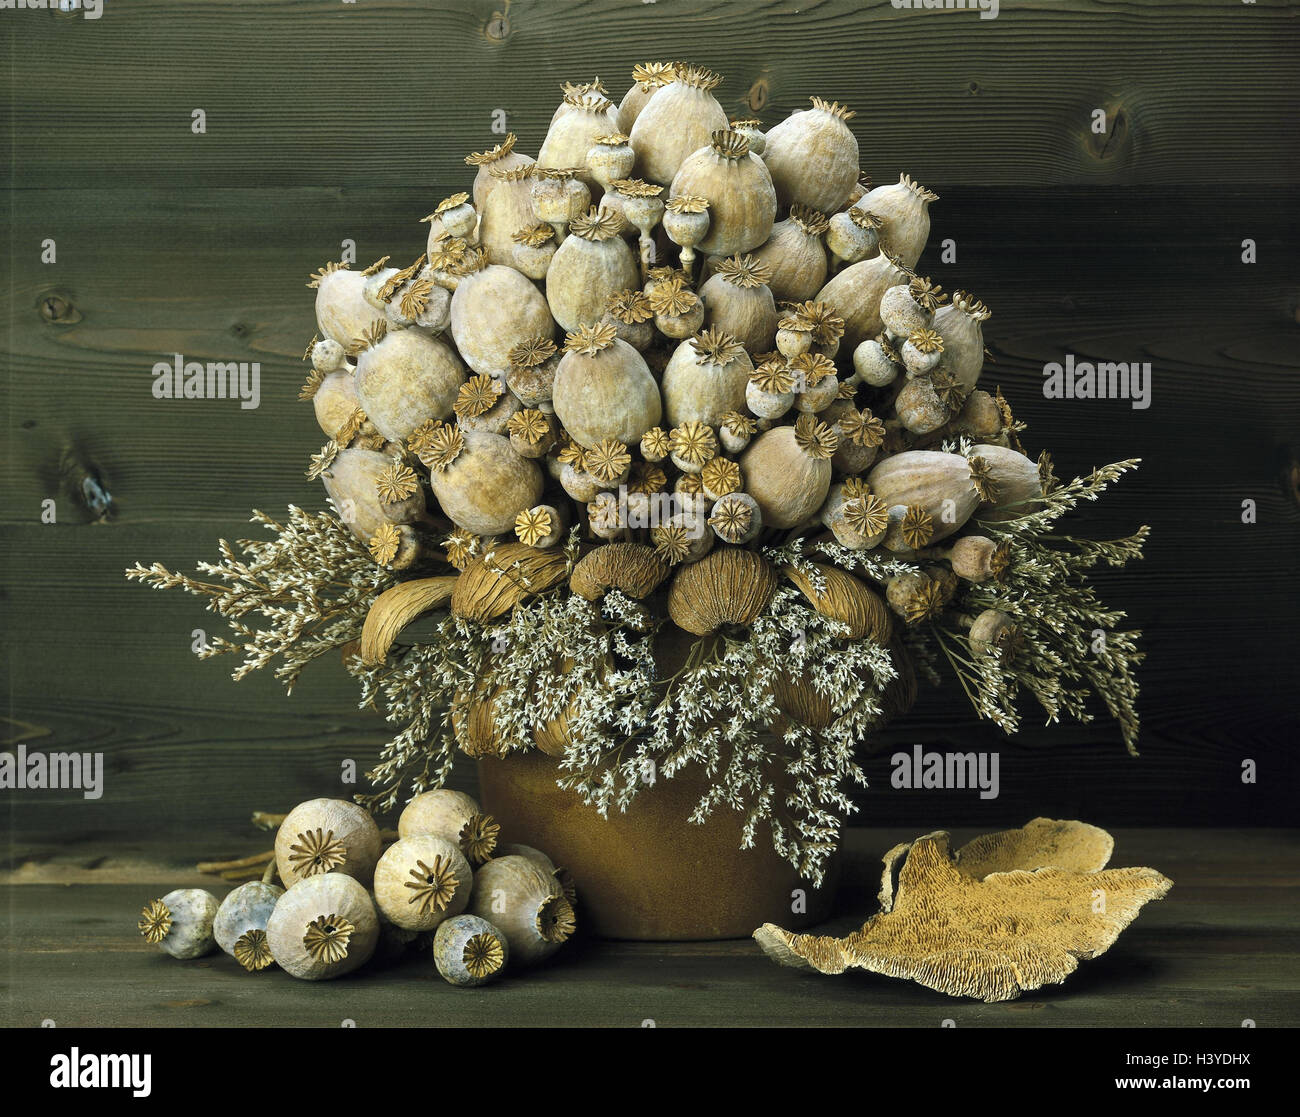 Dry bouquet, dry flowers, poppy seed capsules, arrangement, decoration, bouquet, dry - Stock Image